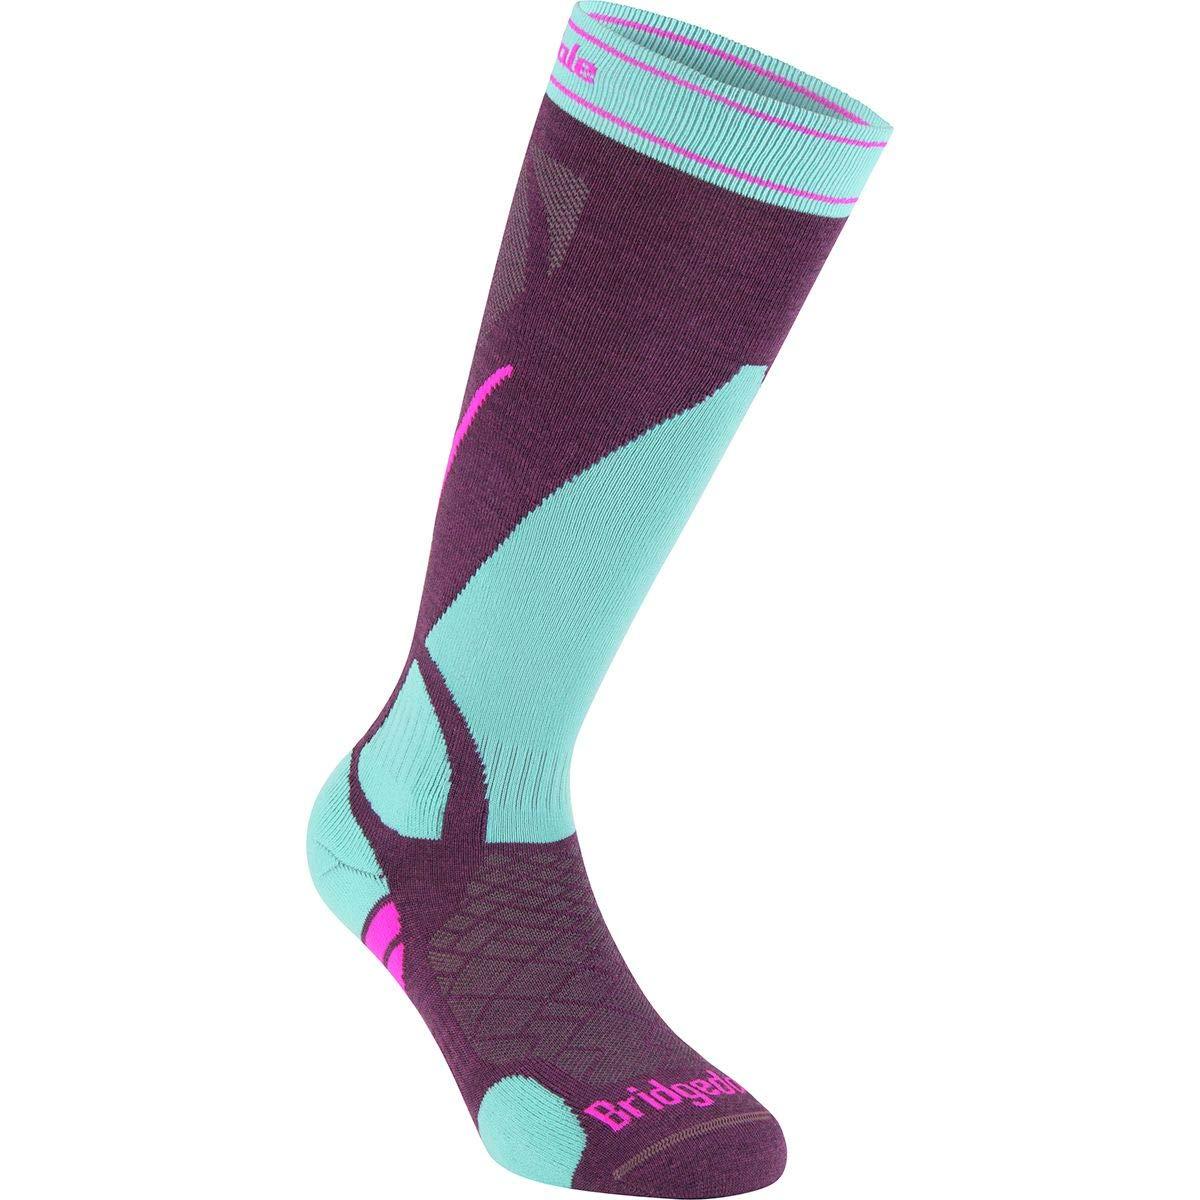 Merino Endurance Socks Bridgedale Lightweight Ski